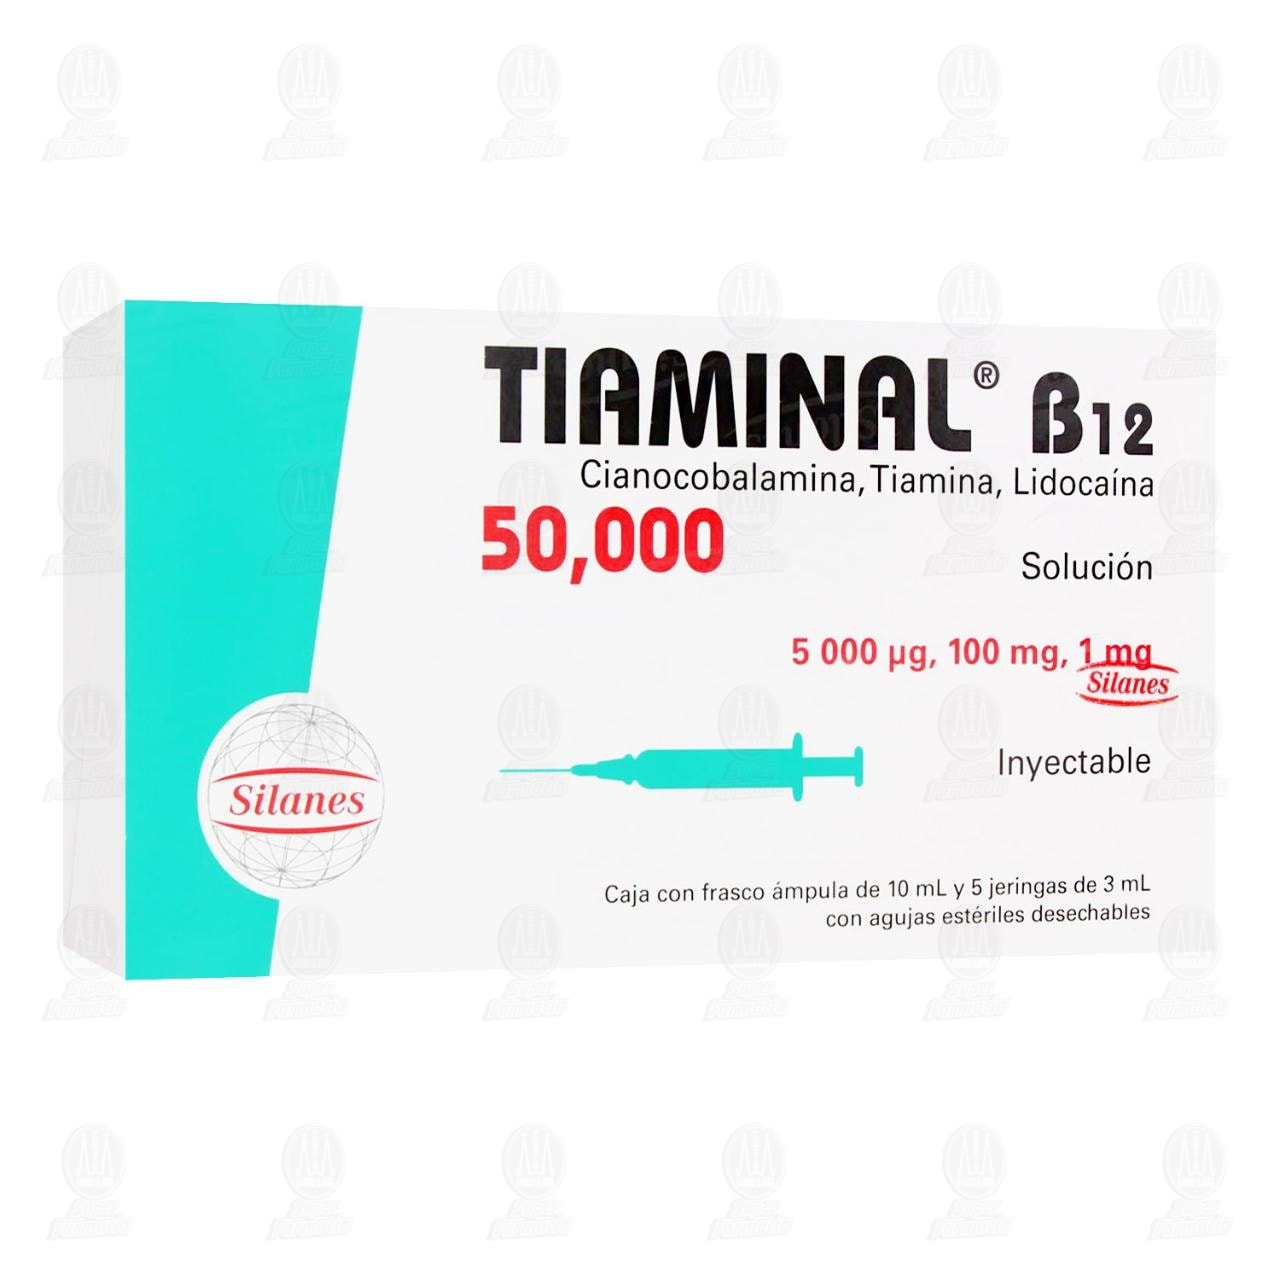 Comprar Tiaminal B12 50,000mcg/100mg/1mg 5 Jeringas de 3ml en Farmacias Guadalajara